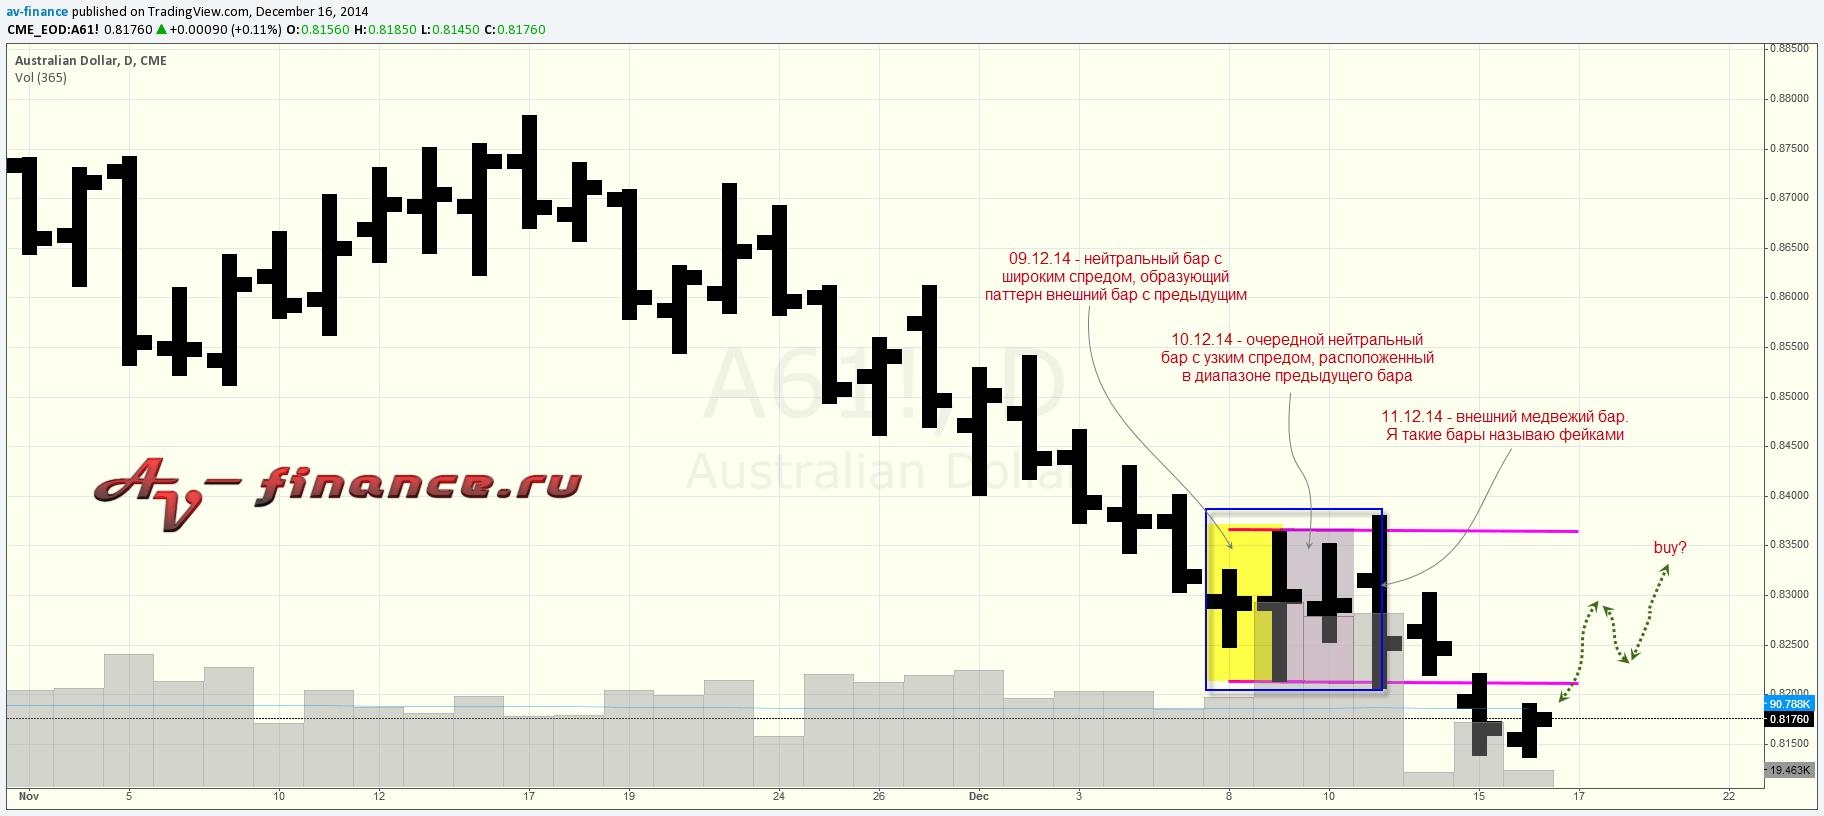 Анализ объема на австралийском долларе-2